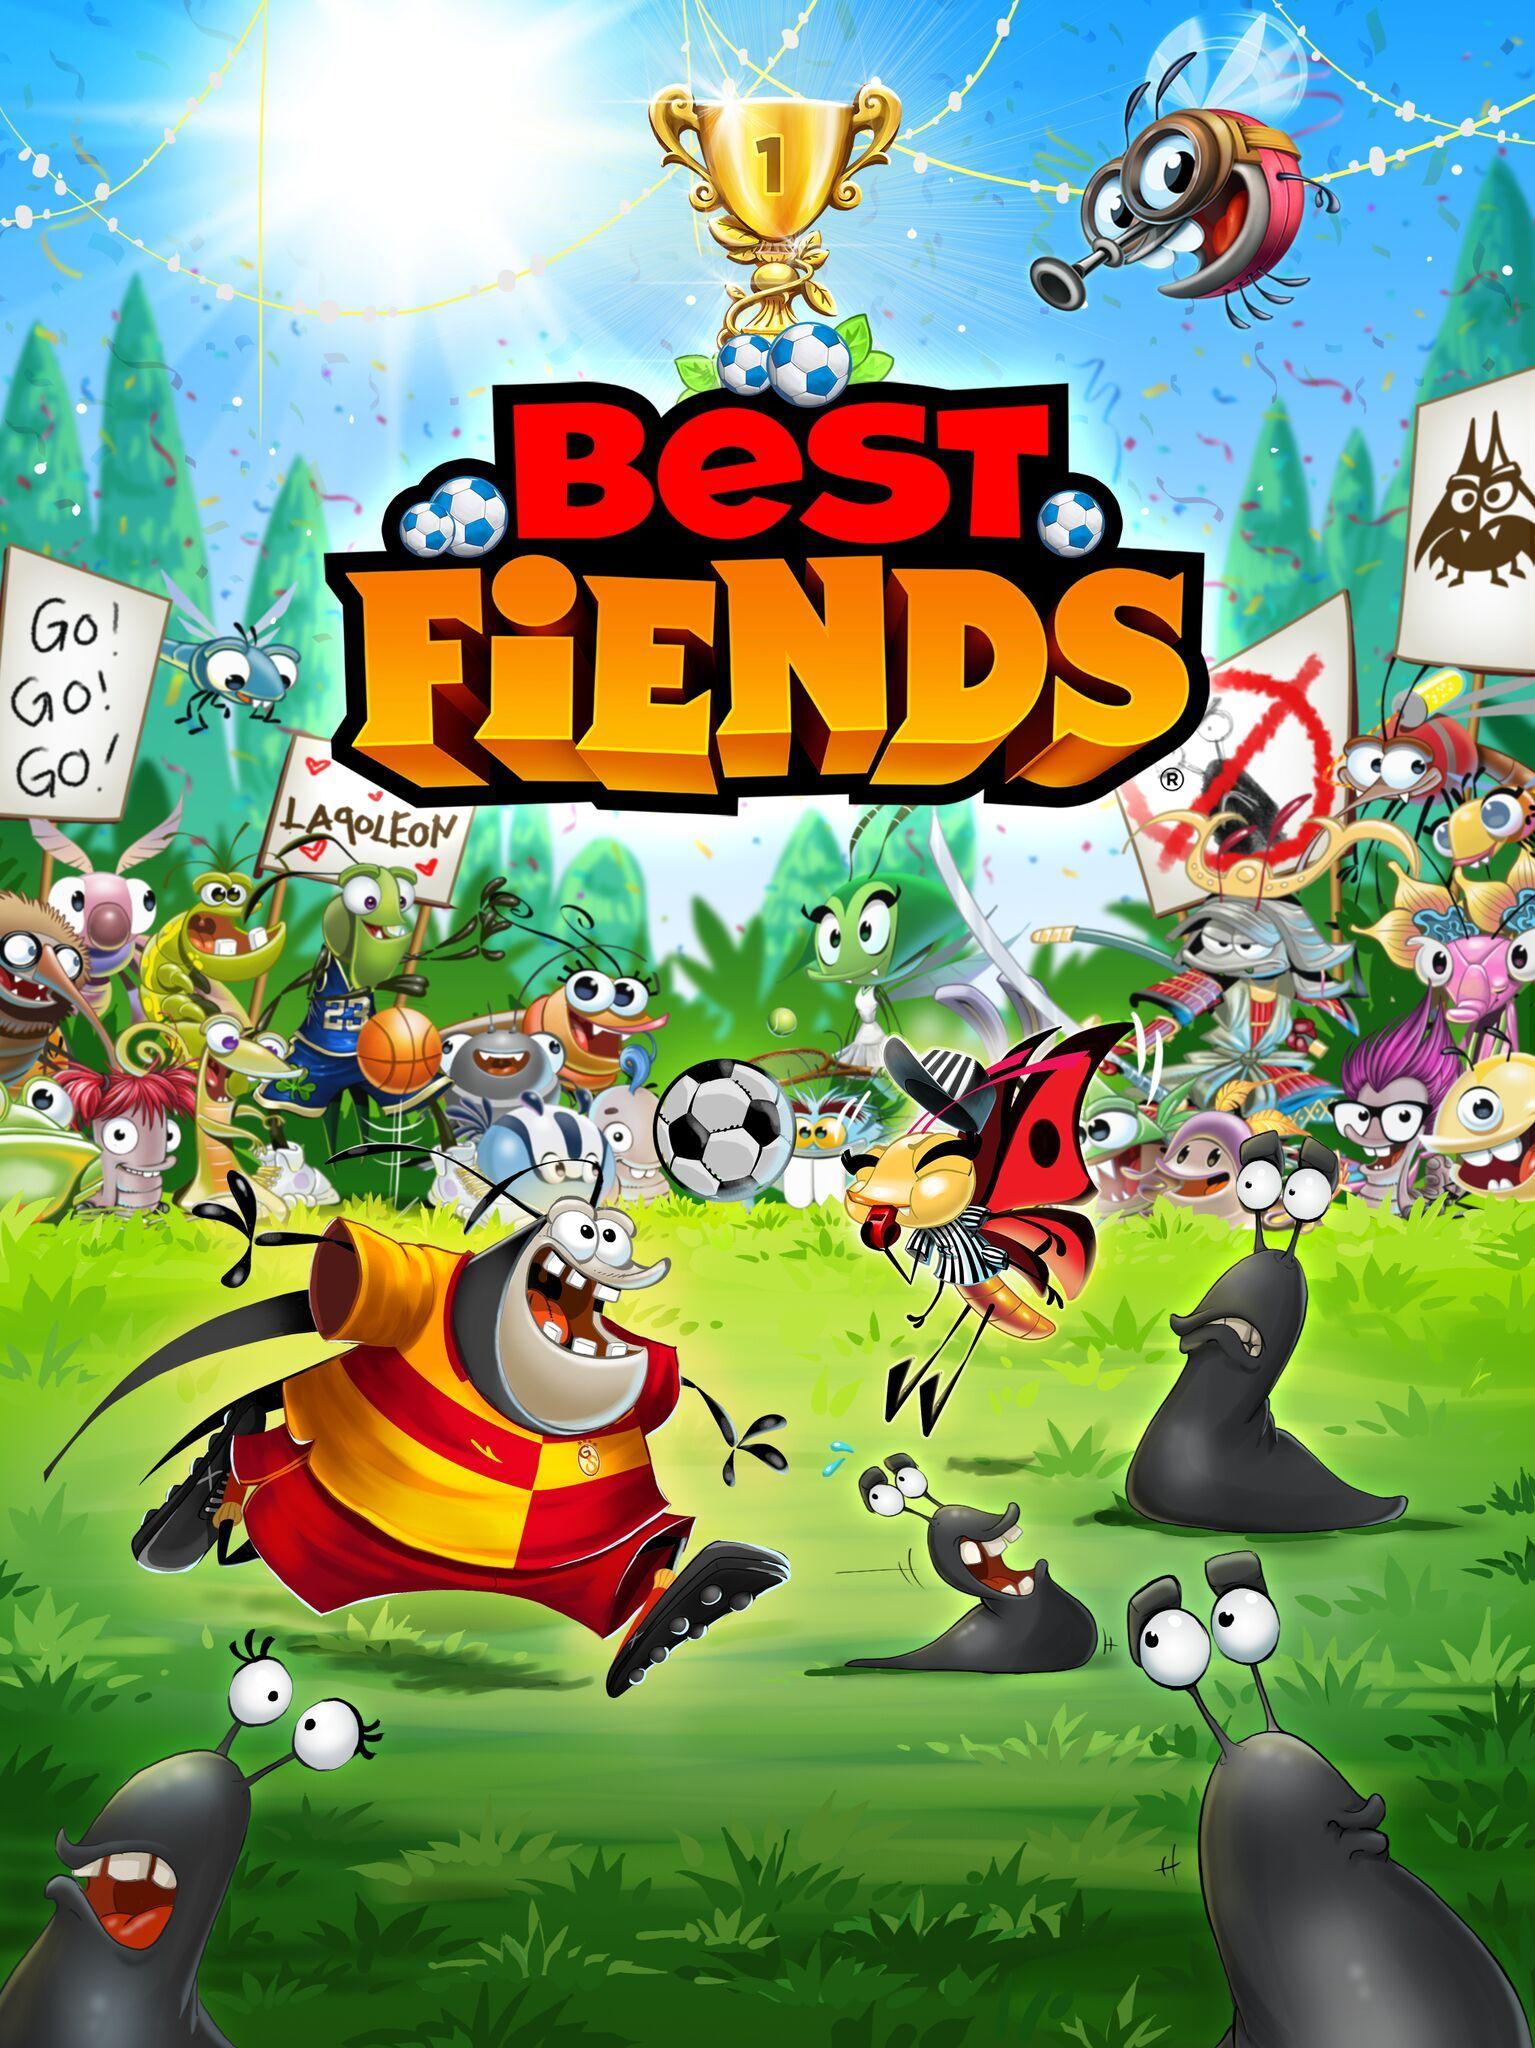 Best Fiends, Futbol 2018 Best fiends, Fiend, Splash screen